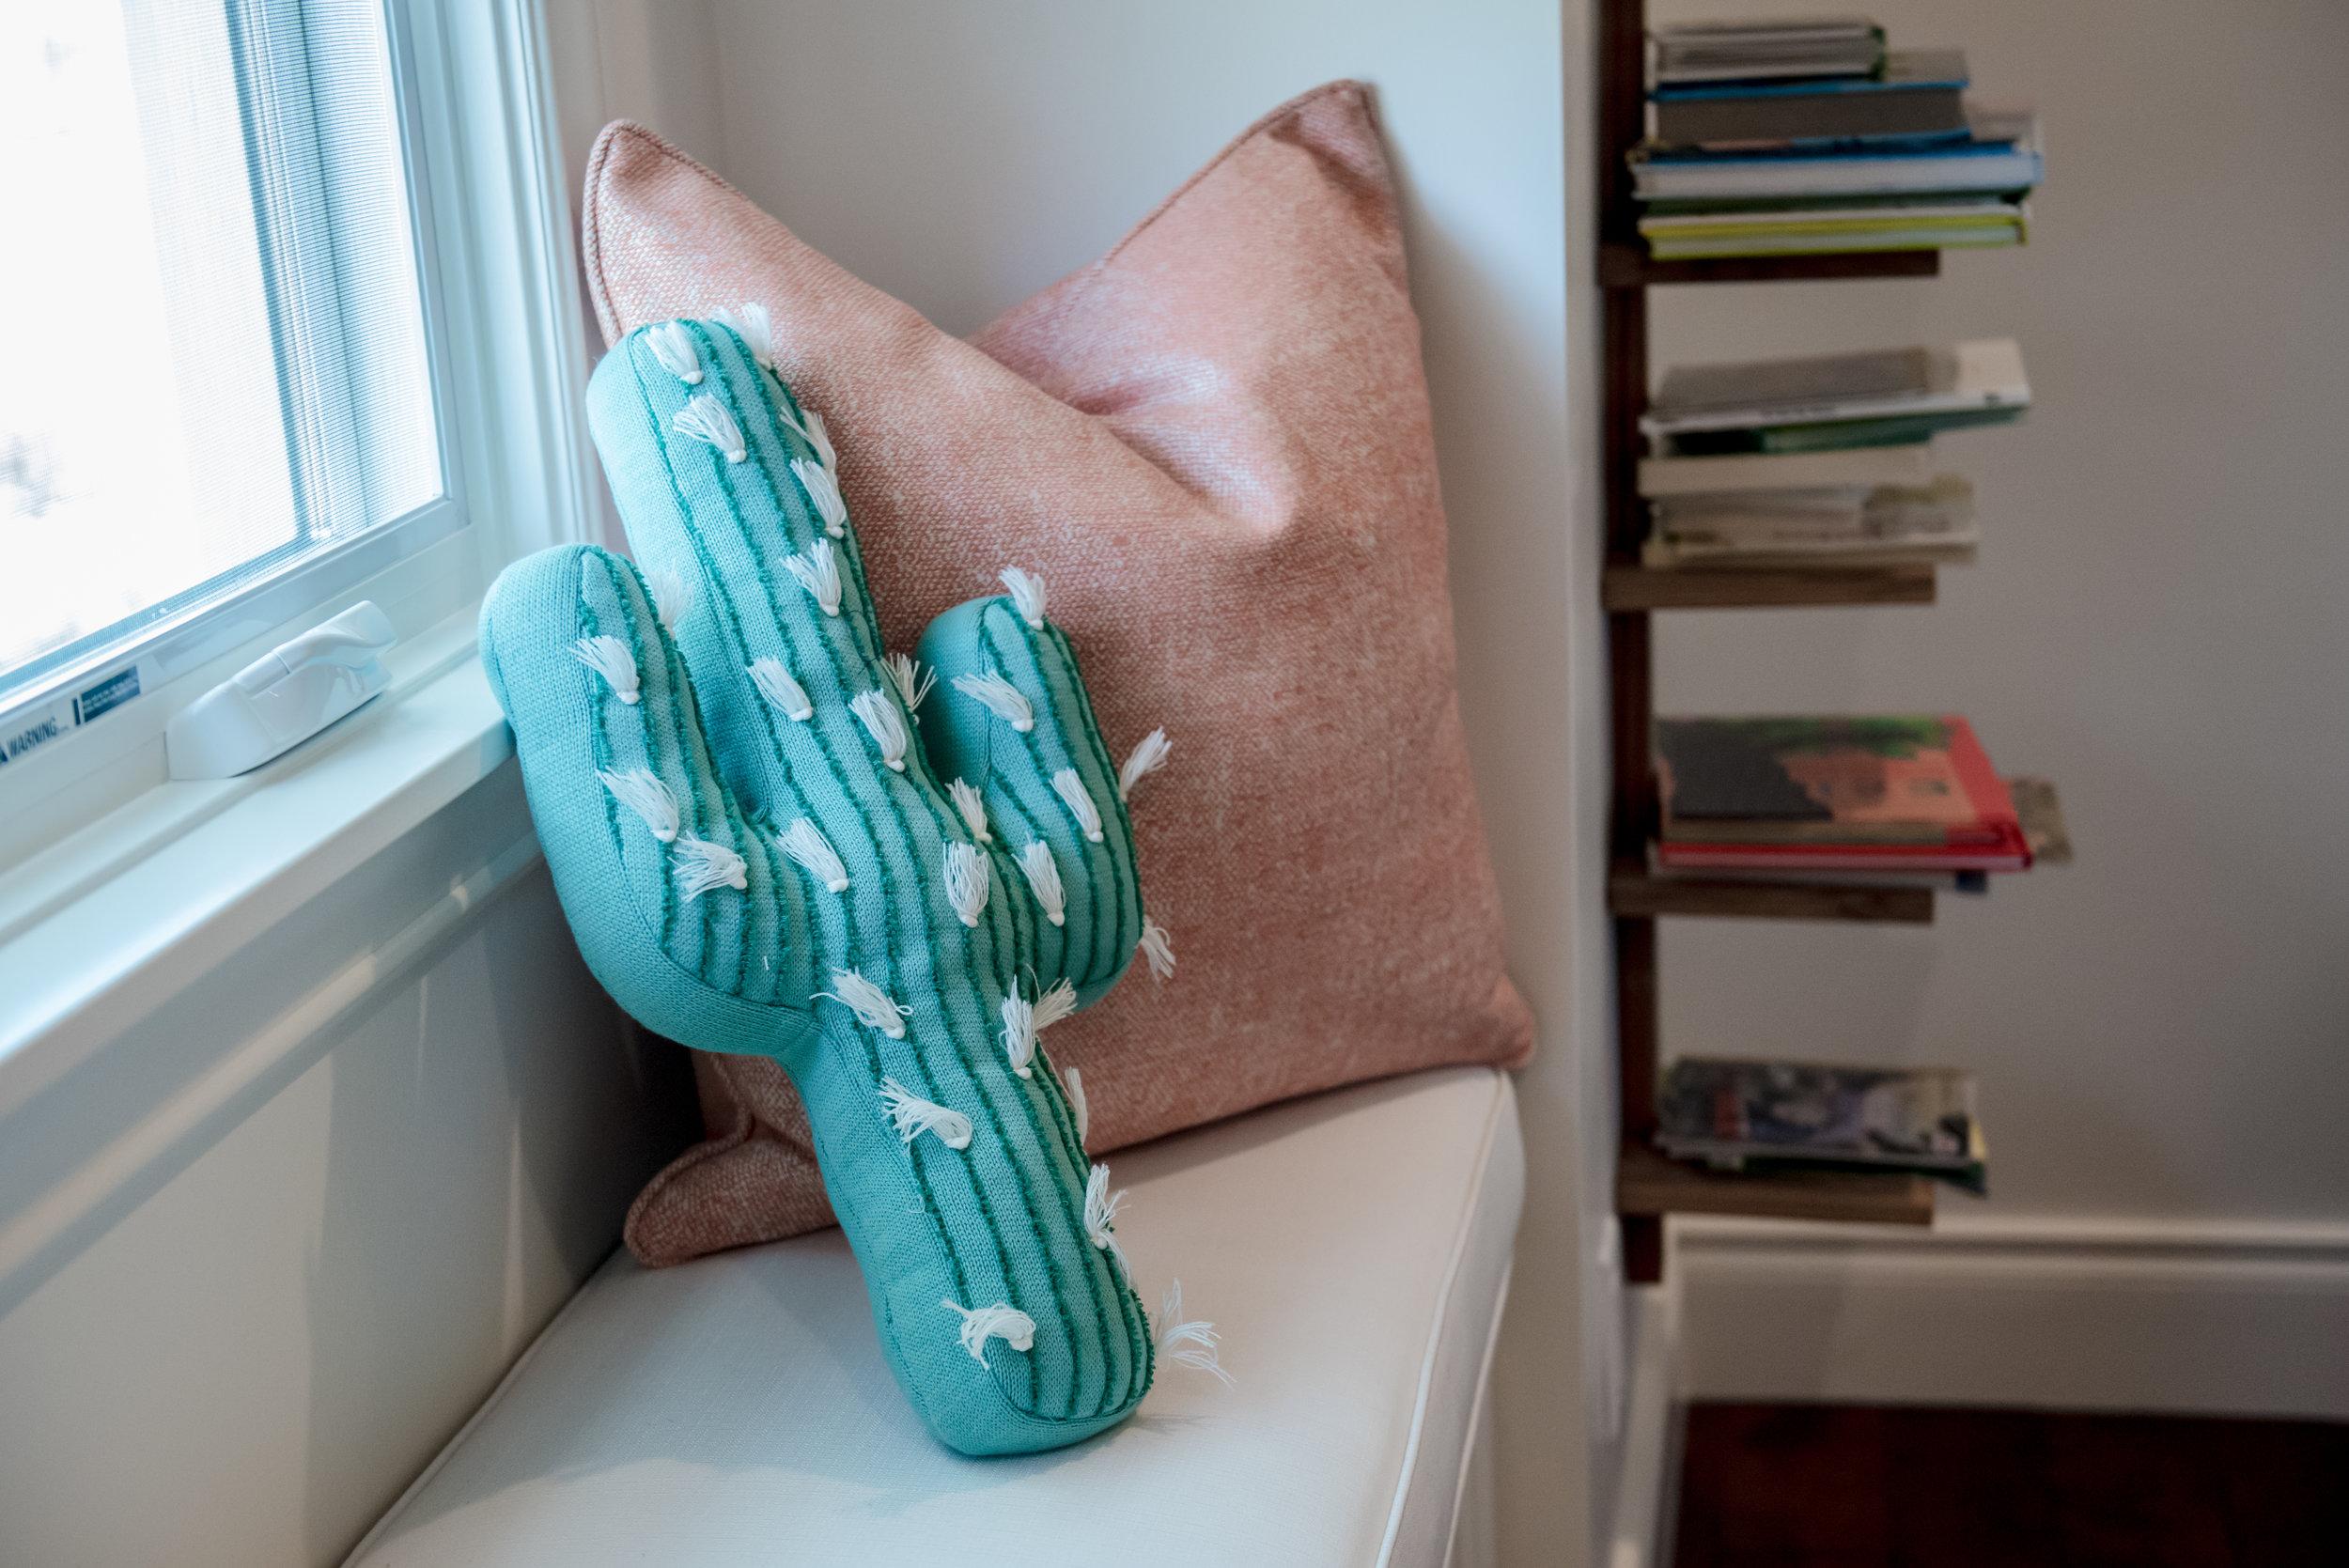 50+cactus+books+windowseat+pillows+accessories+kidspace.jpg